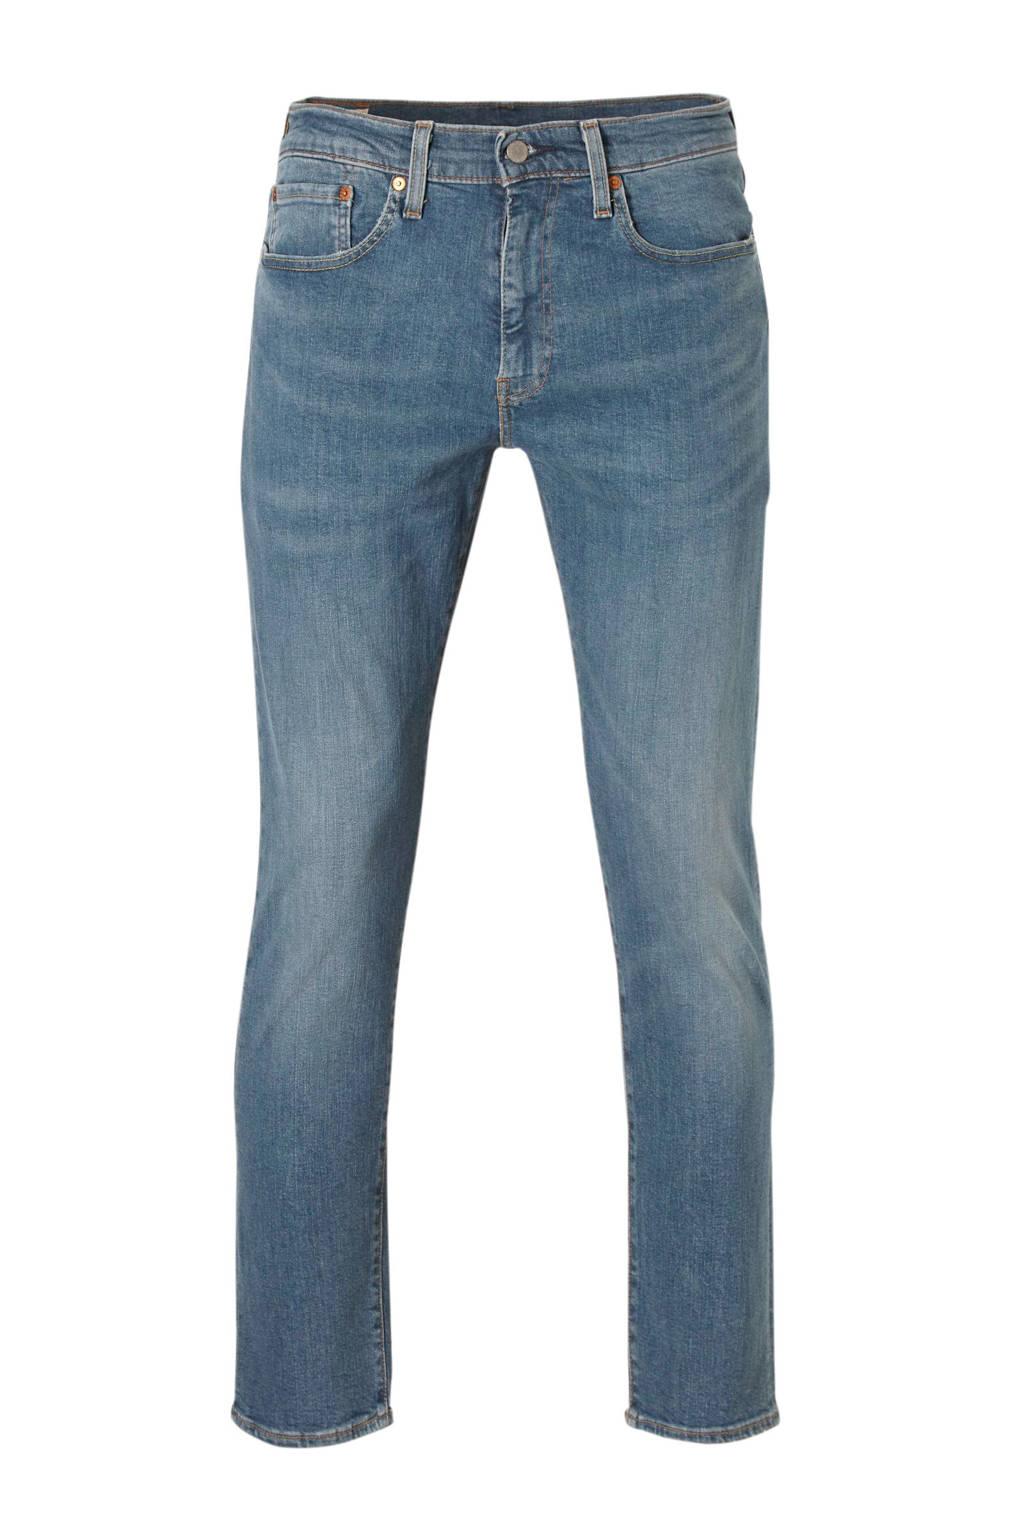 Levi's regular fit jeans 502 taper, Light denim